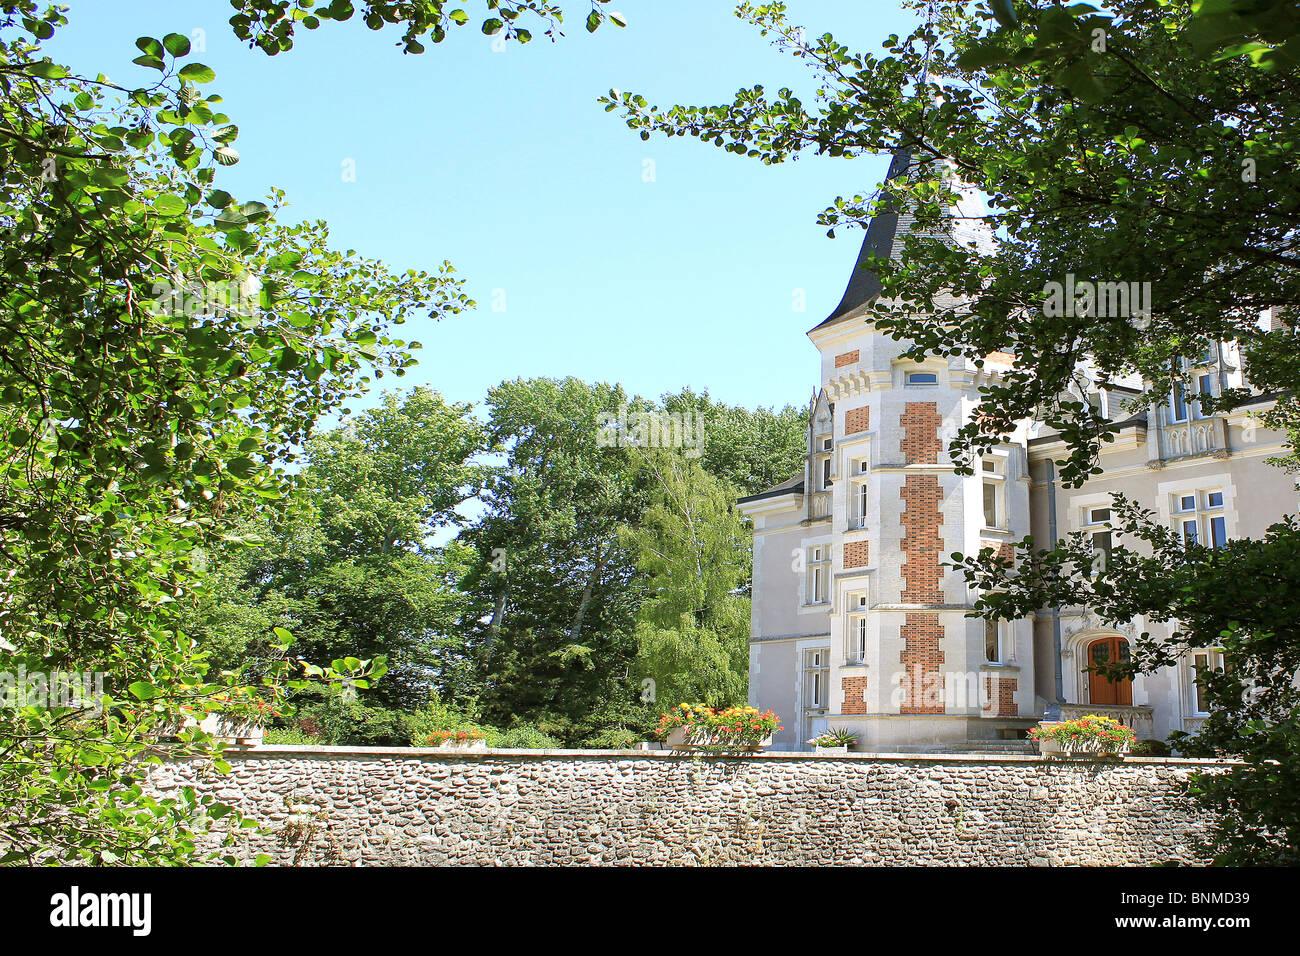 Photo of Castle in Villemandeur Lisledon in the Loiret Stock Photo